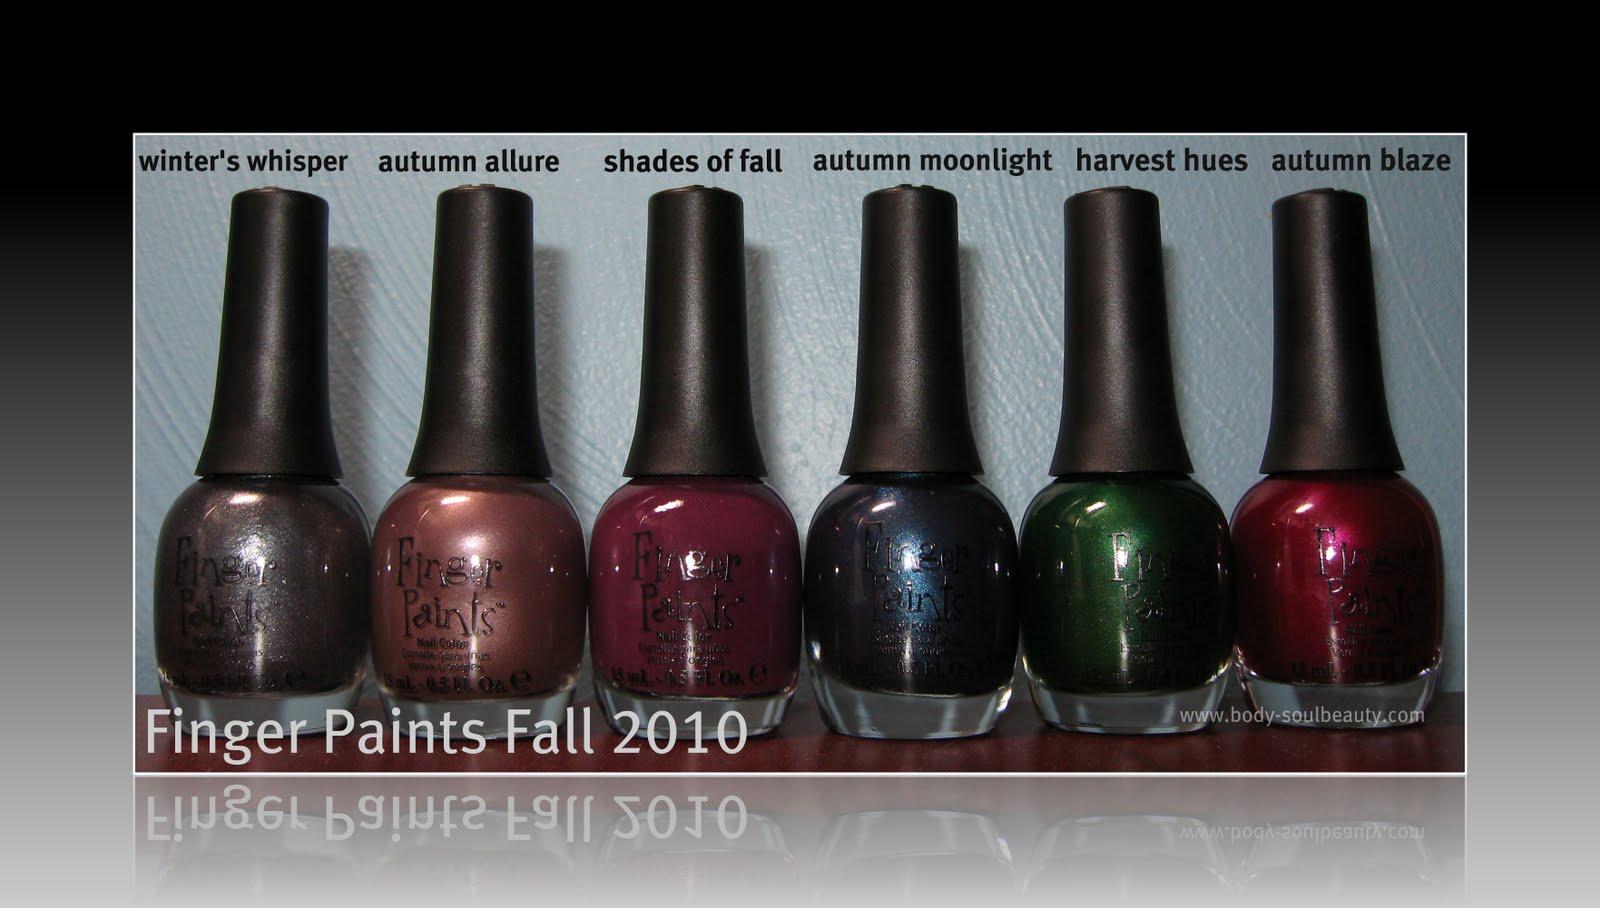 Finger Paints Fall 2010   Body & Soul